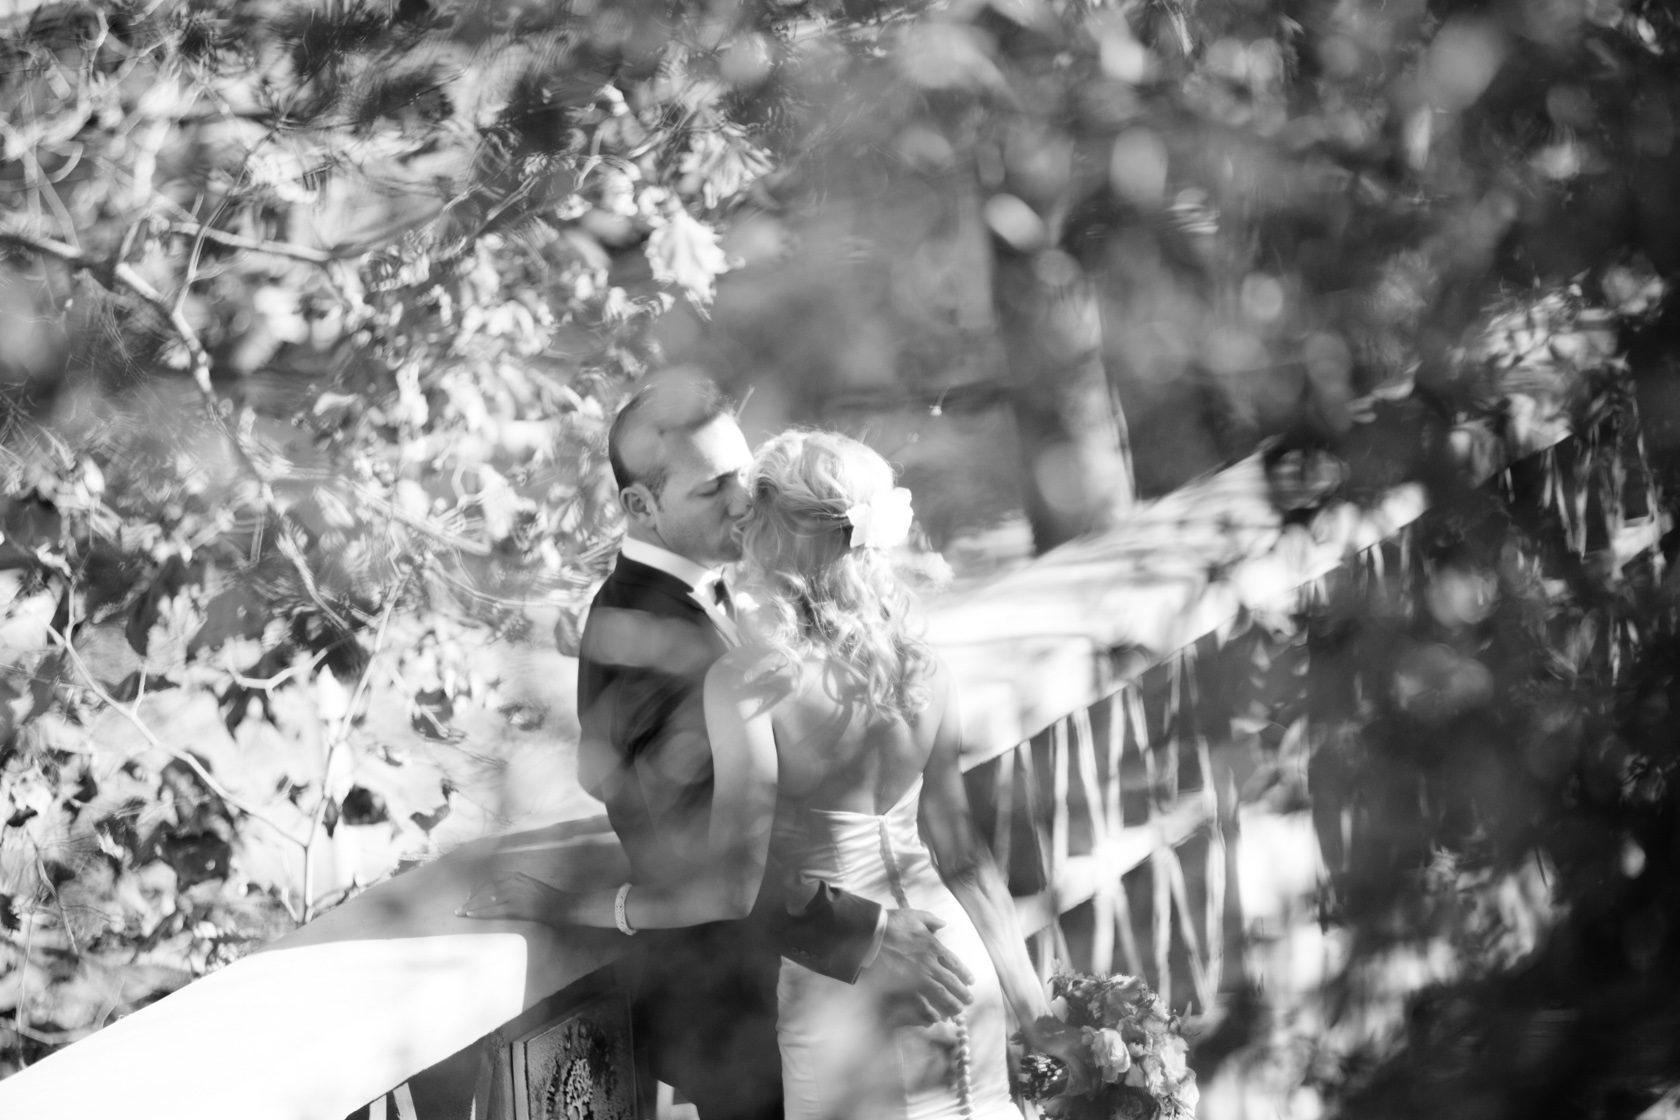 Rancho_Valencia_Resort_Wedding_042-1680x1120.jpg